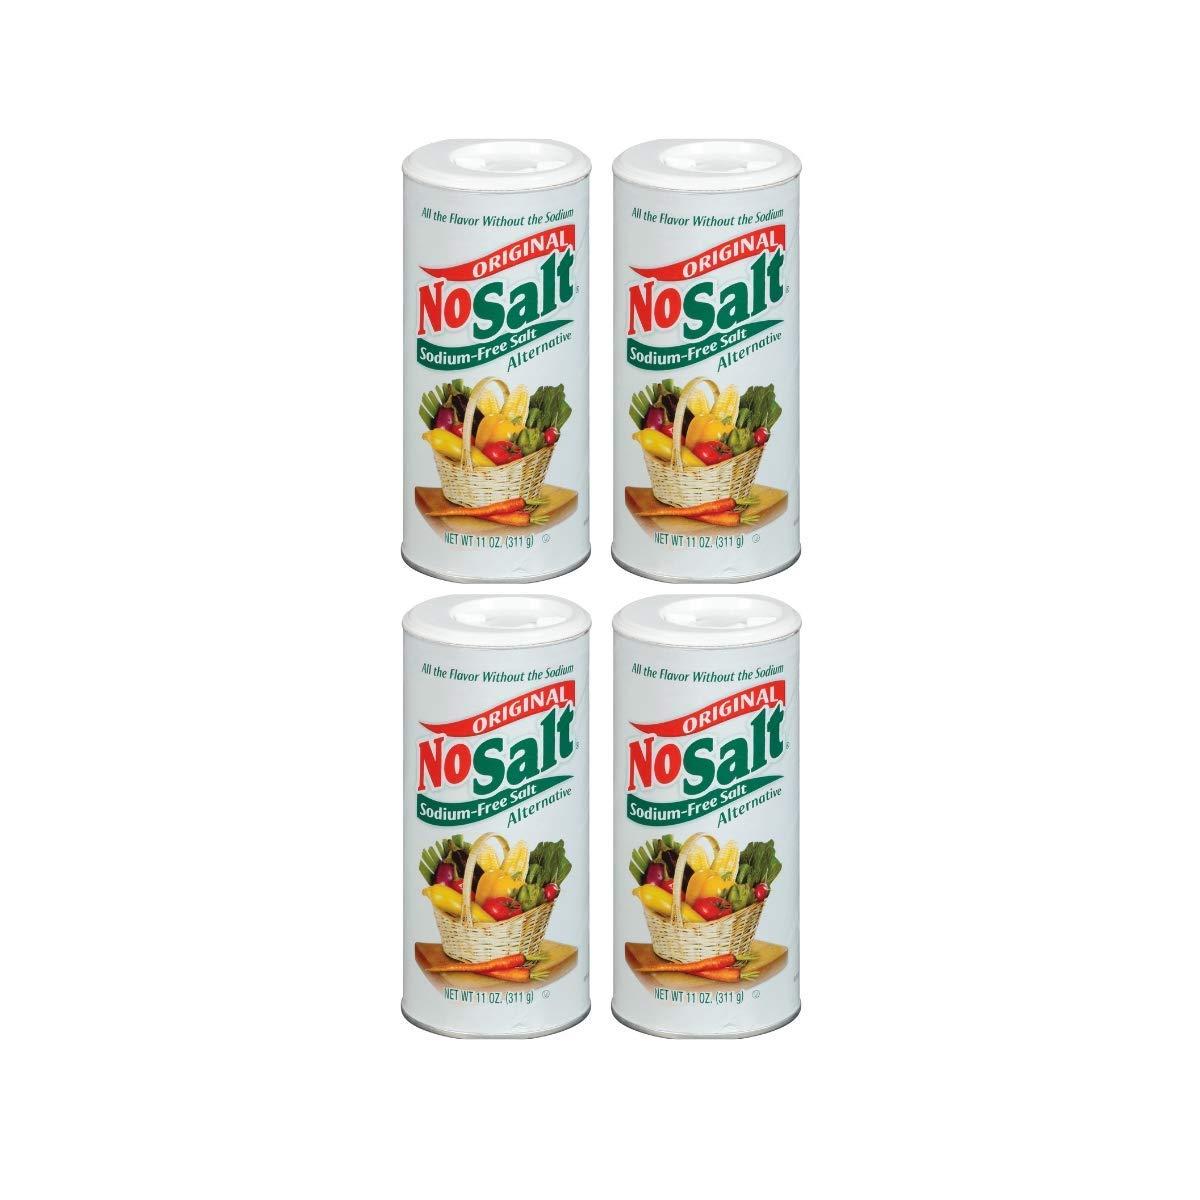 NoSalt Original Sodium-Free Salt Alternative (11oz Canister 4 pack)